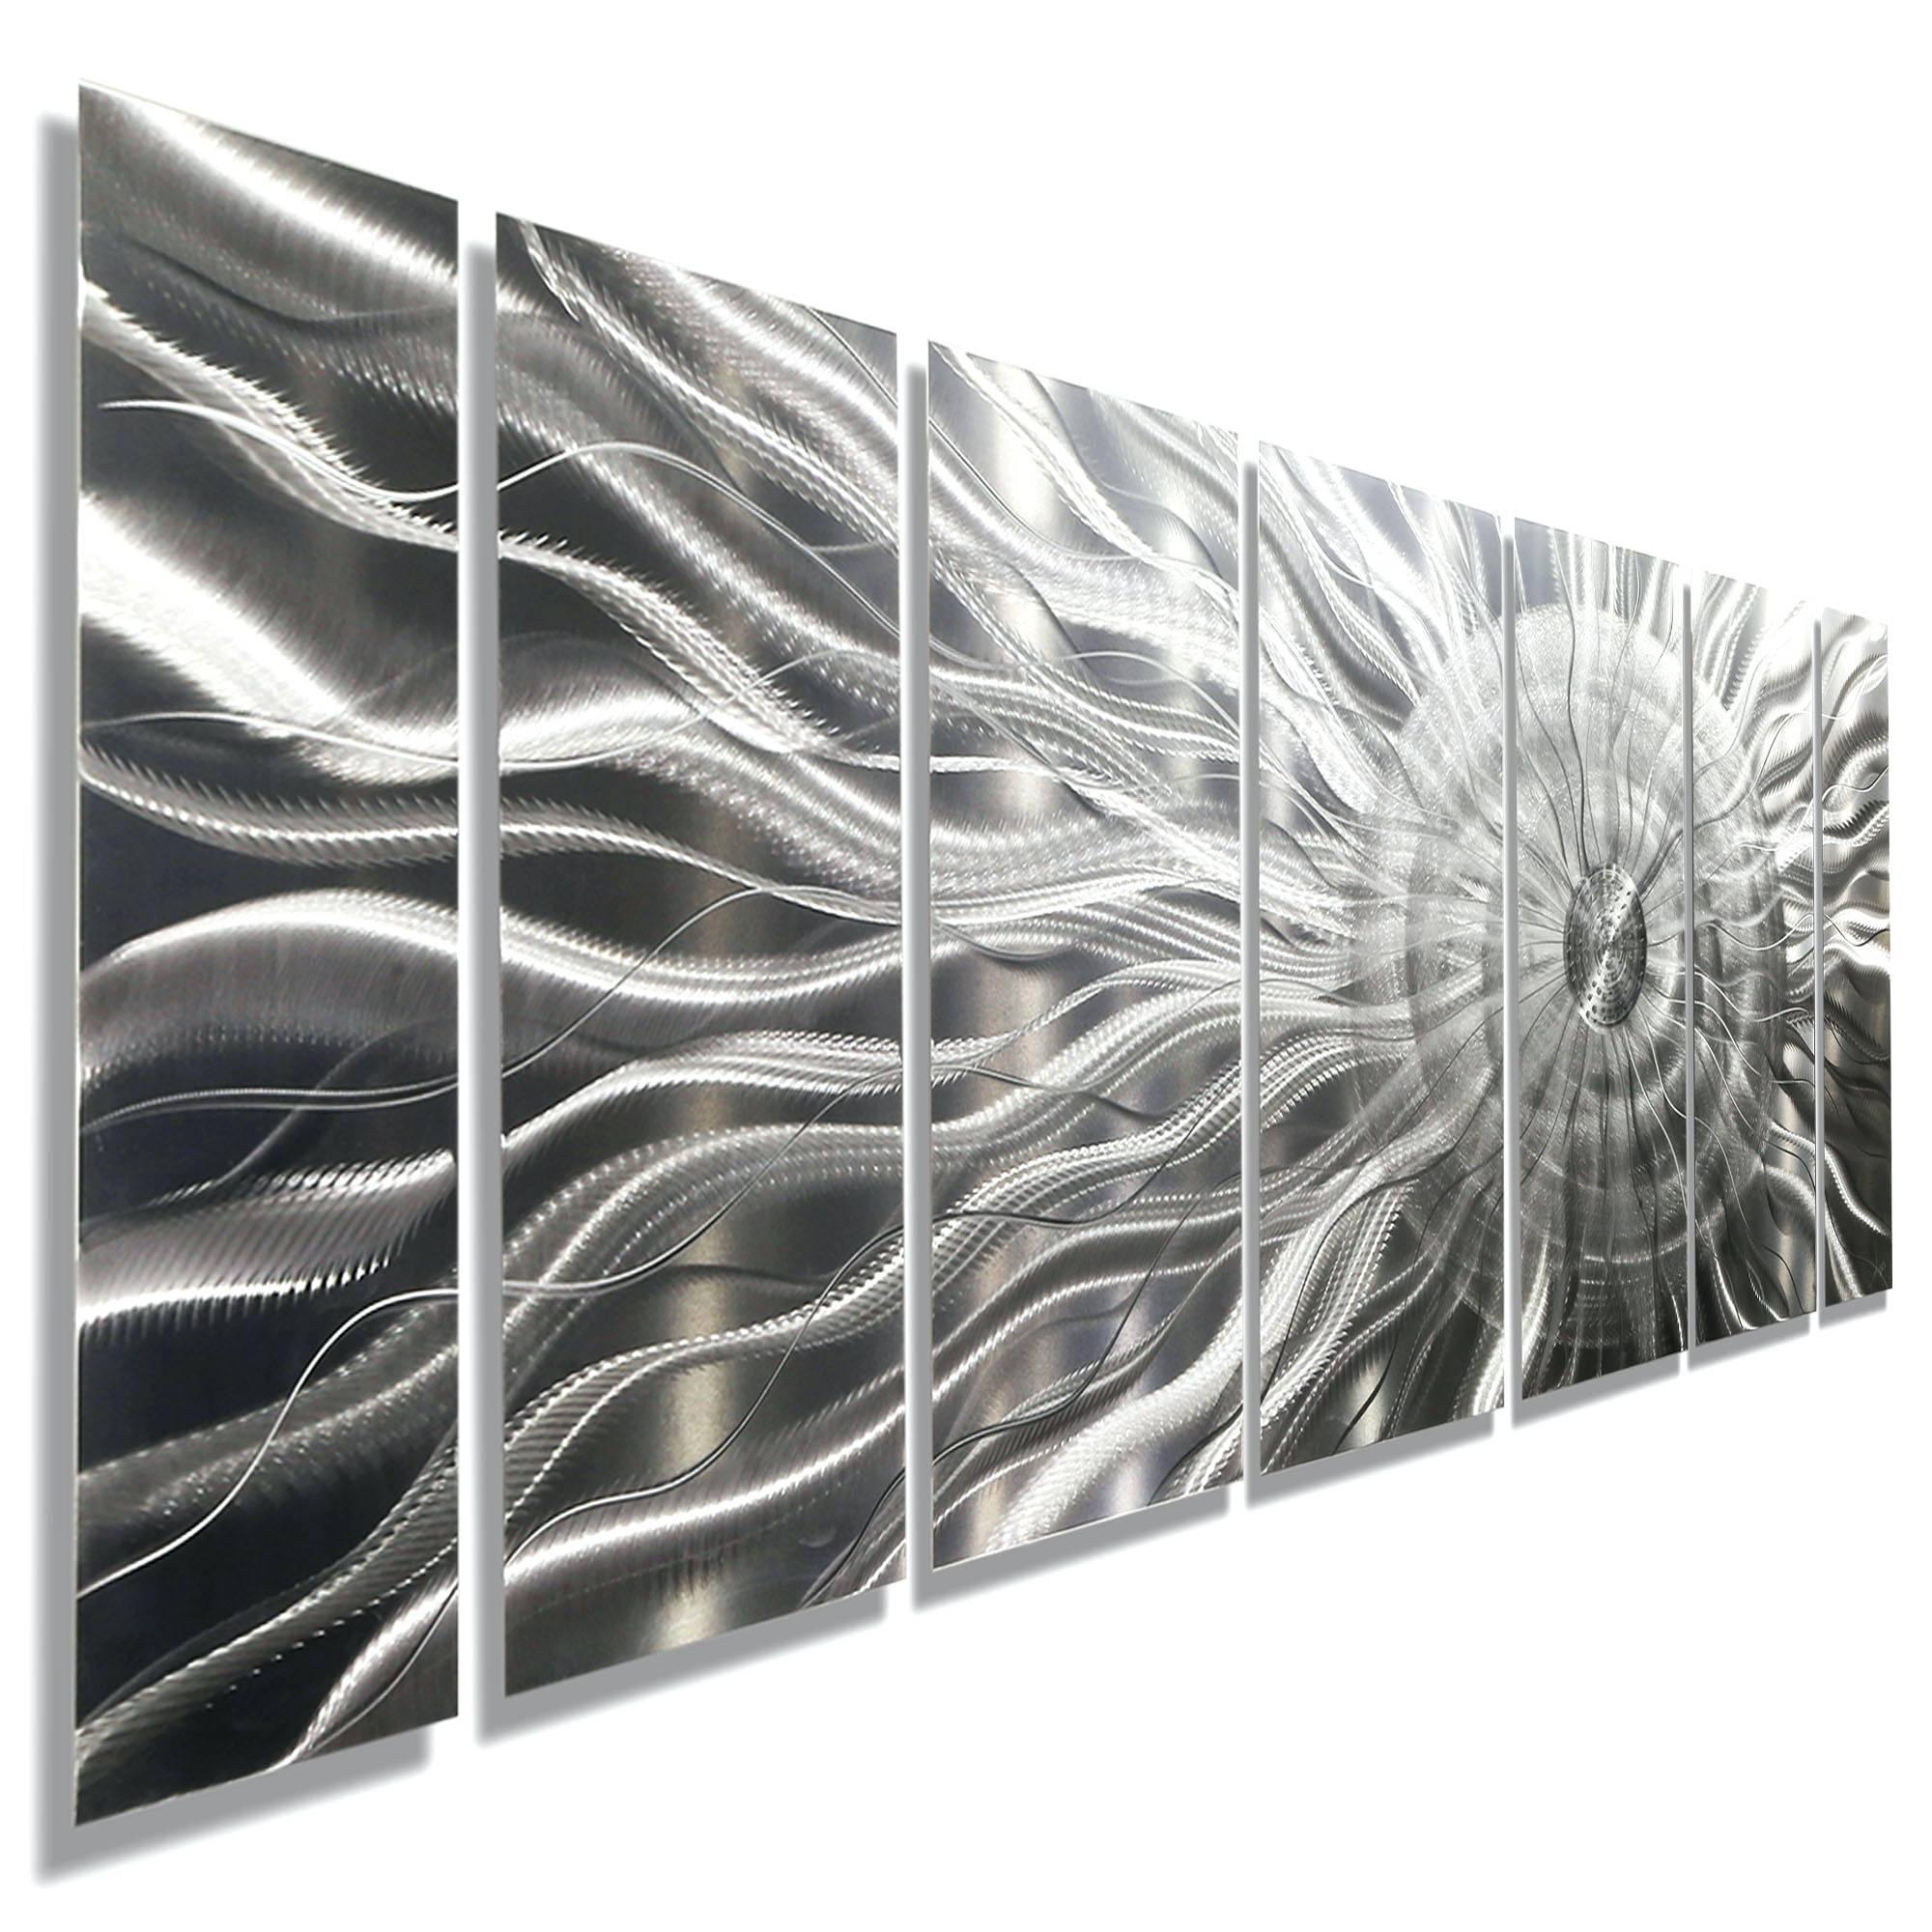 Wall Arts ~ Extra Large Metal Wall Art Abstract Metal Wall Art In Latest Contemporary Large Metal Wall Art (View 13 of 20)